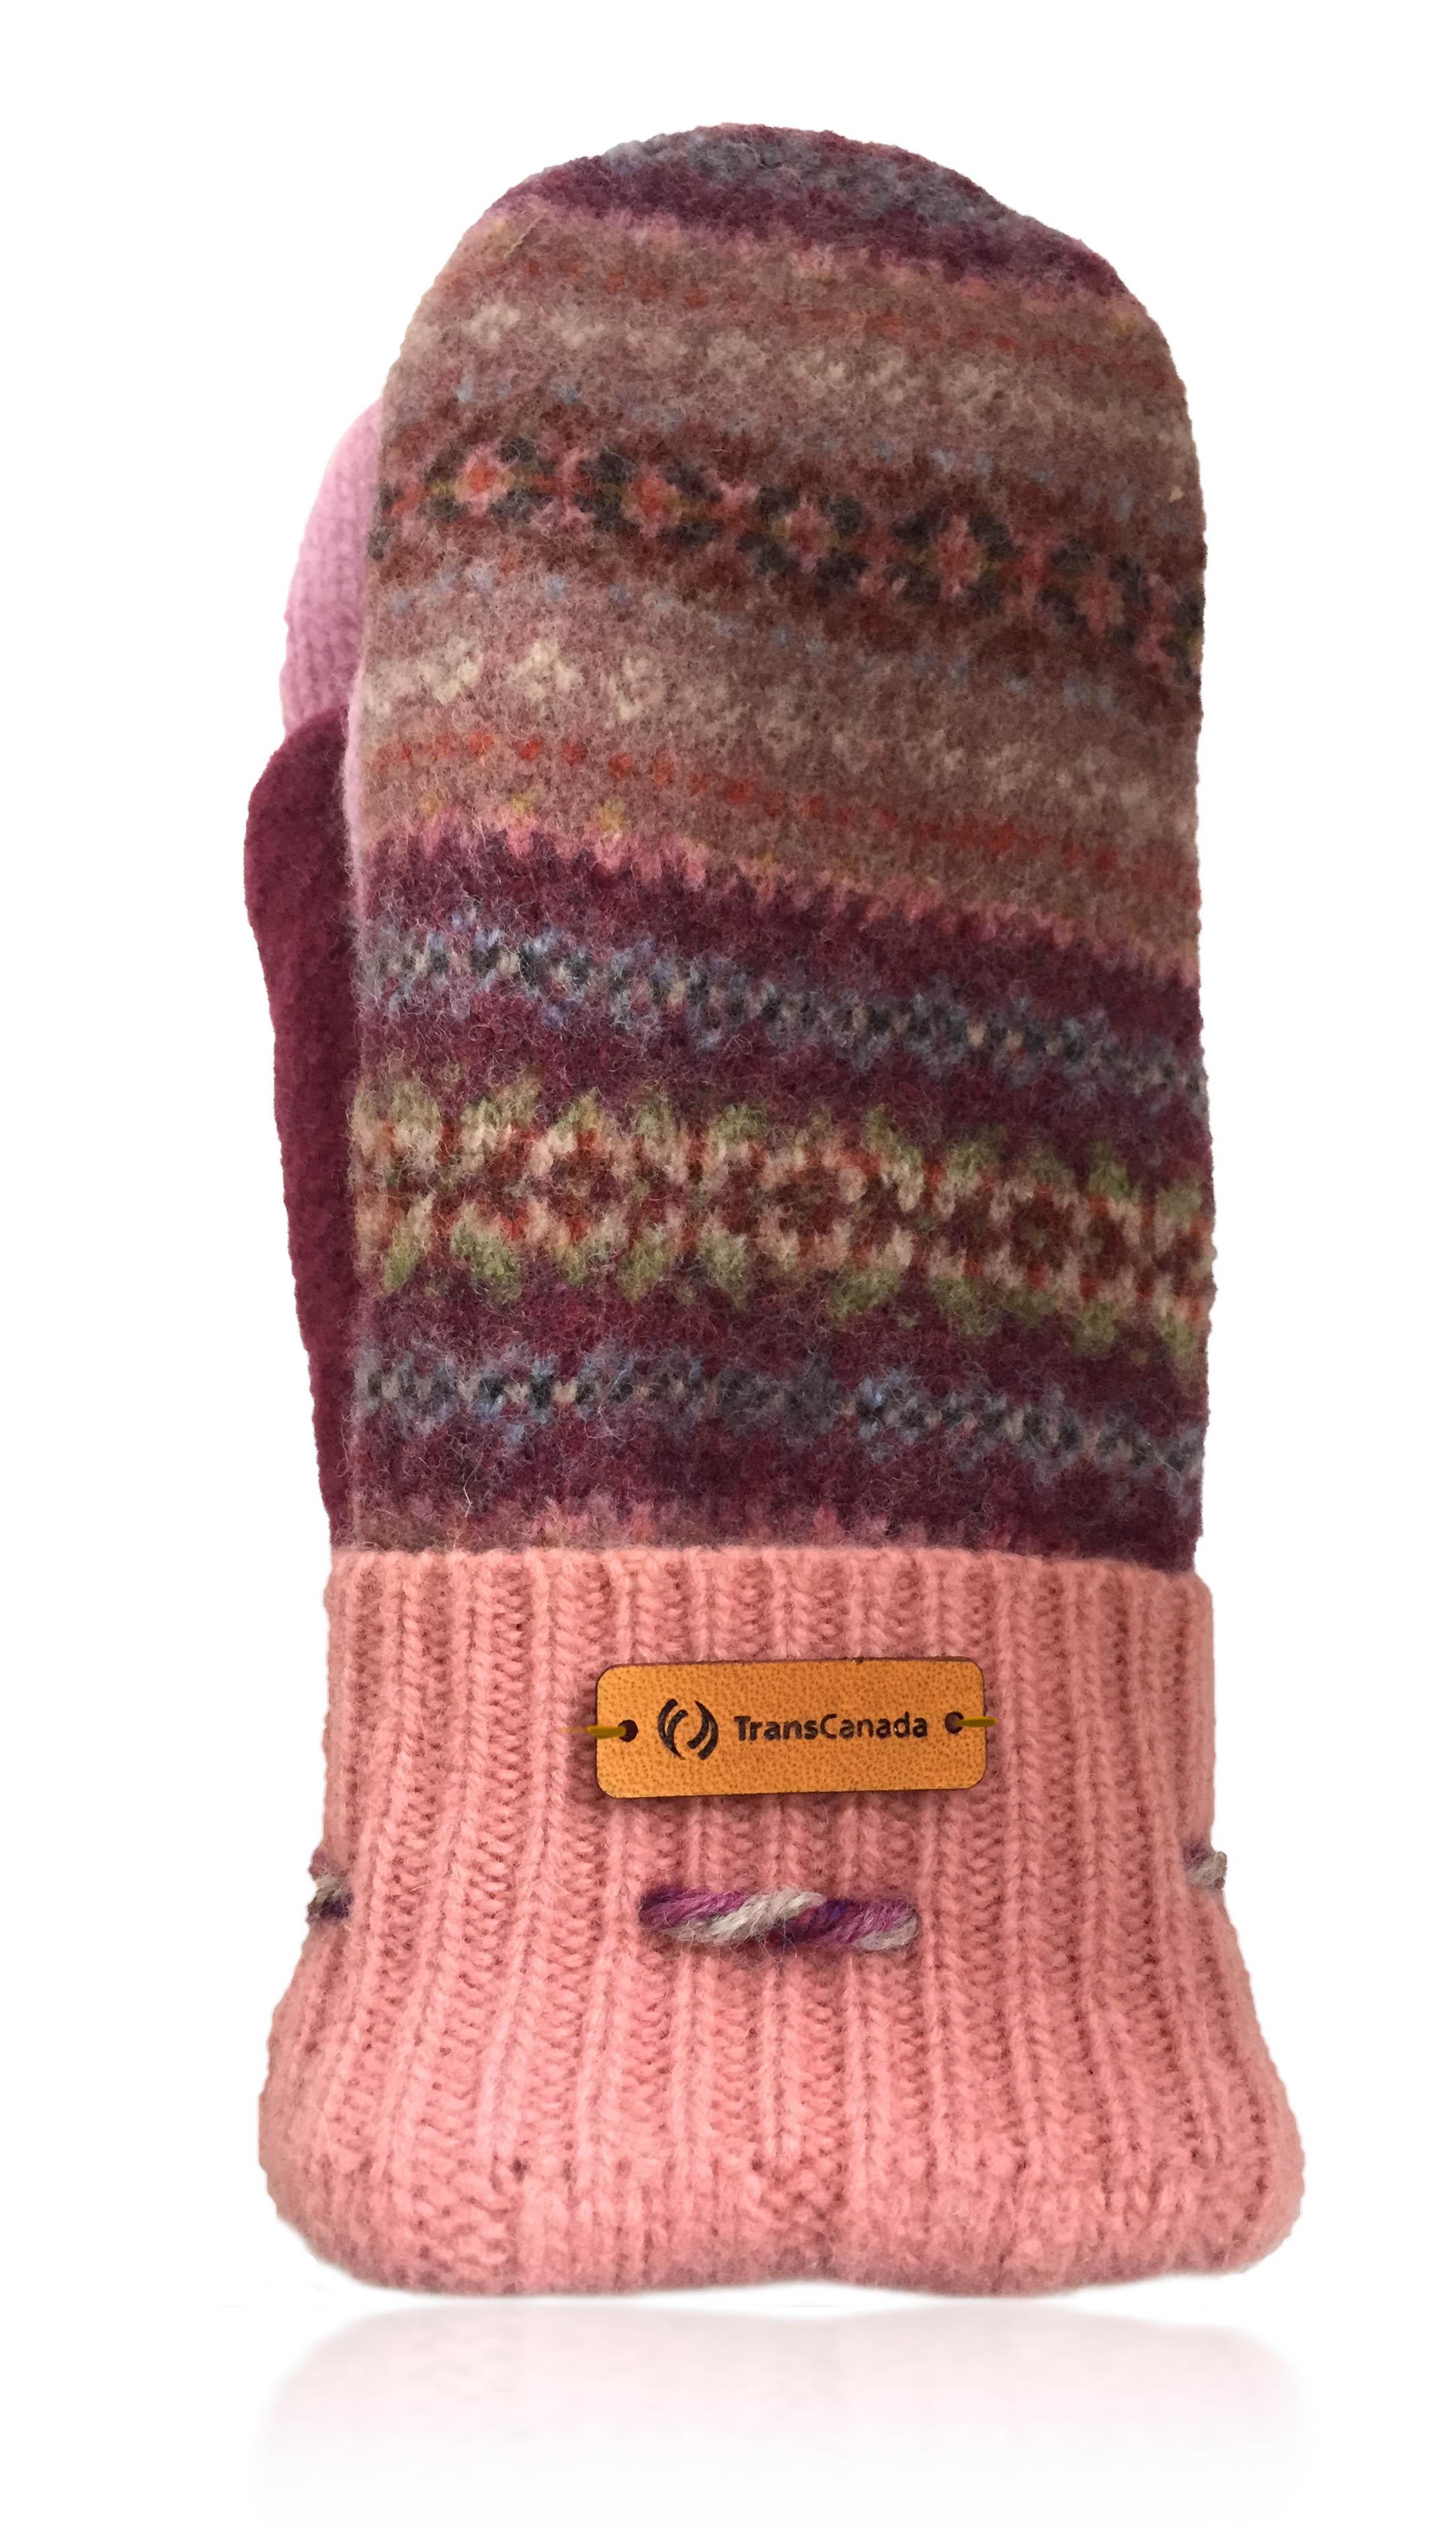 TransCanada Glove LETHRBAR.jpg